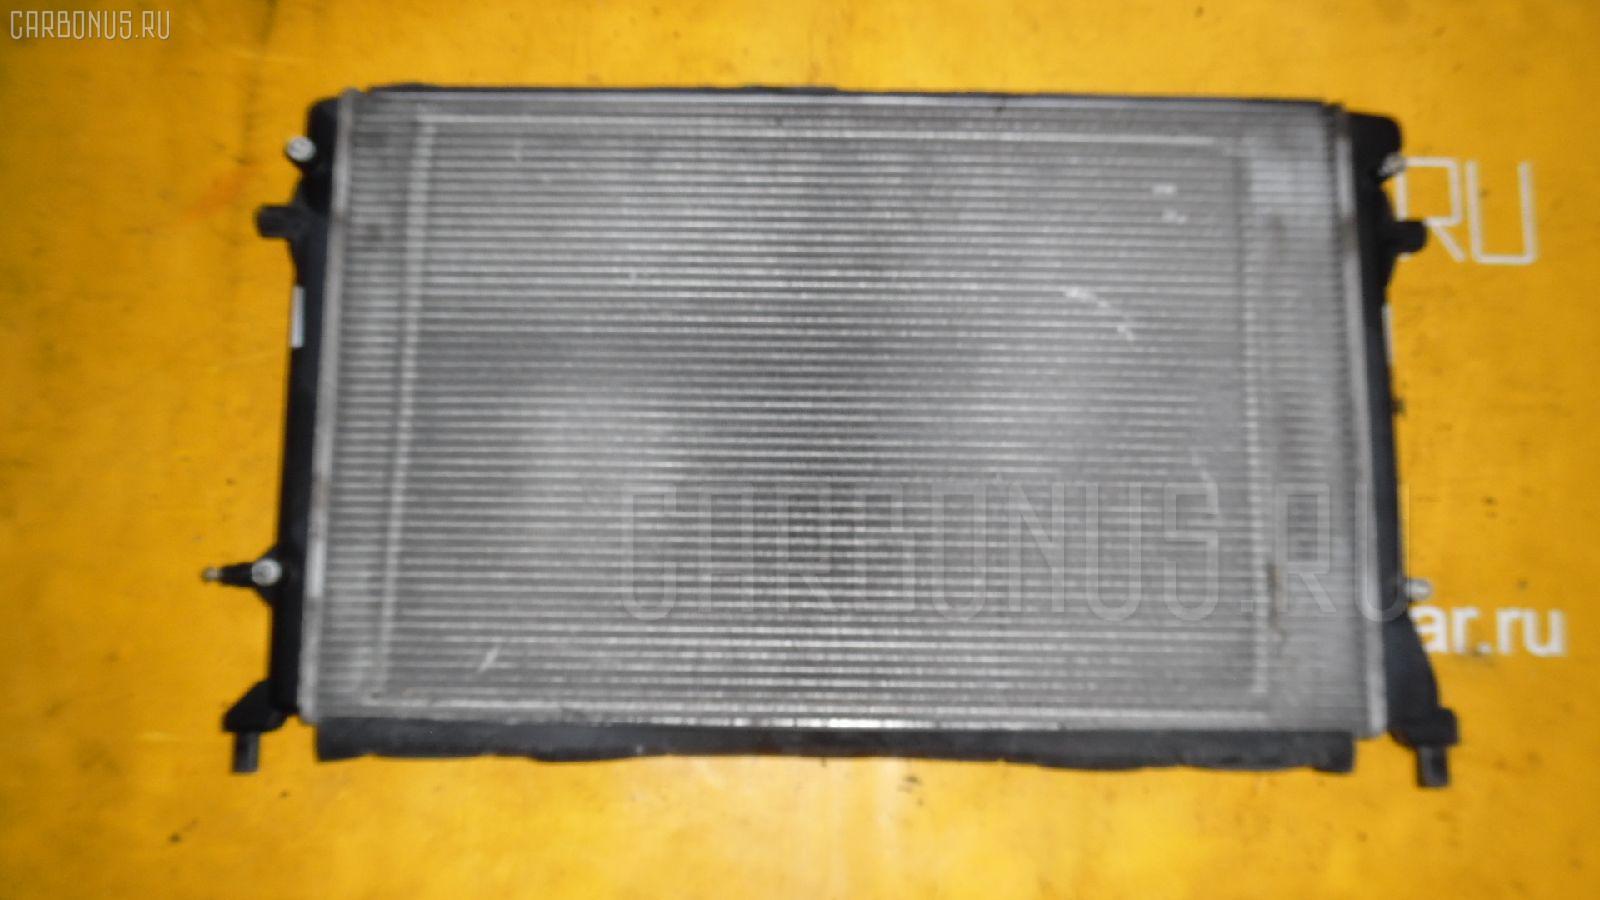 Радиатор ДВС AUDI A3 SPORTBACK 8PBLR BLR Фото 2